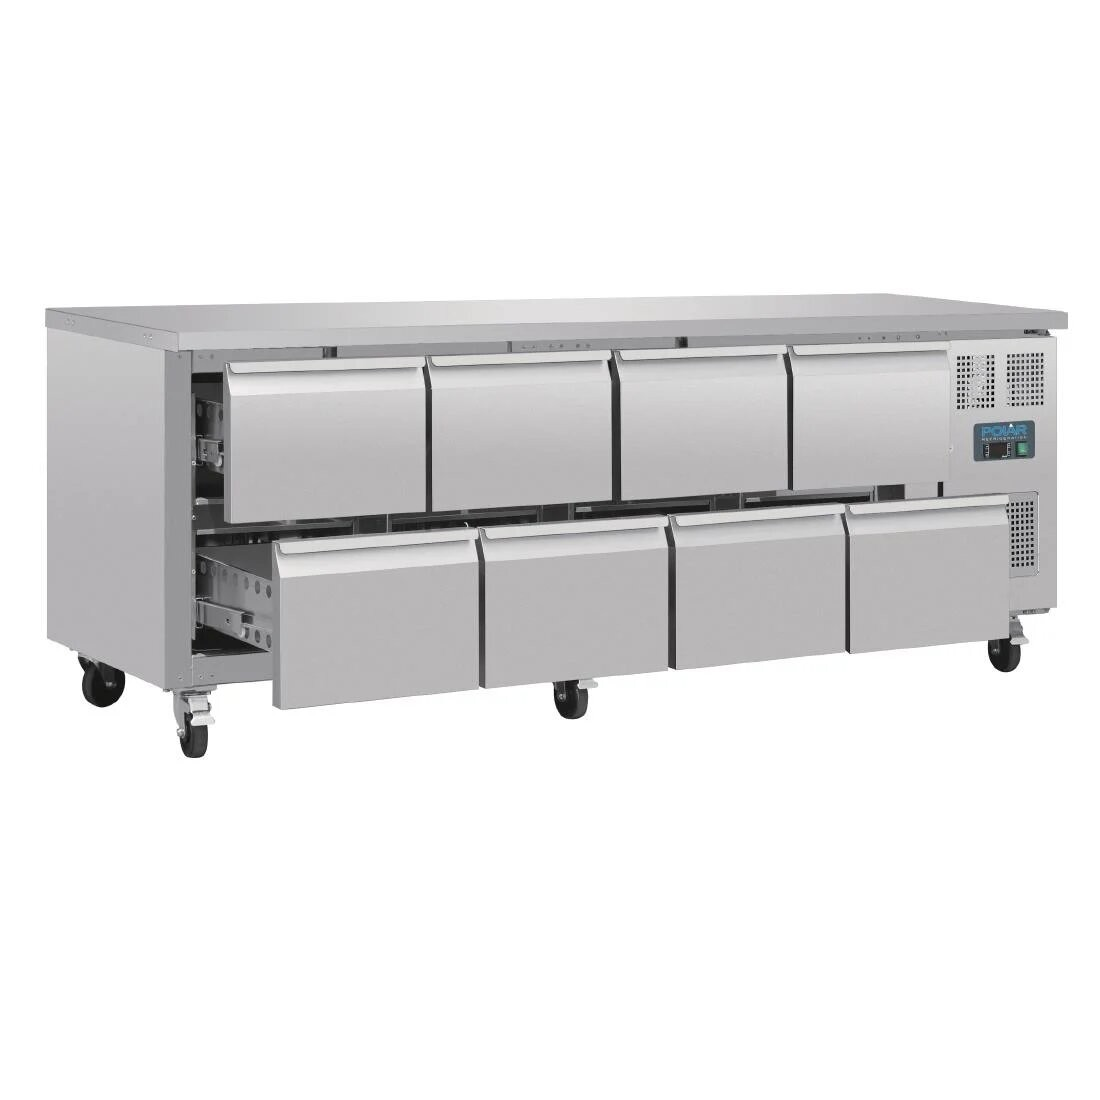 Polar DA549 U-Series Eight Drawer Gastronorm Counter Fridge